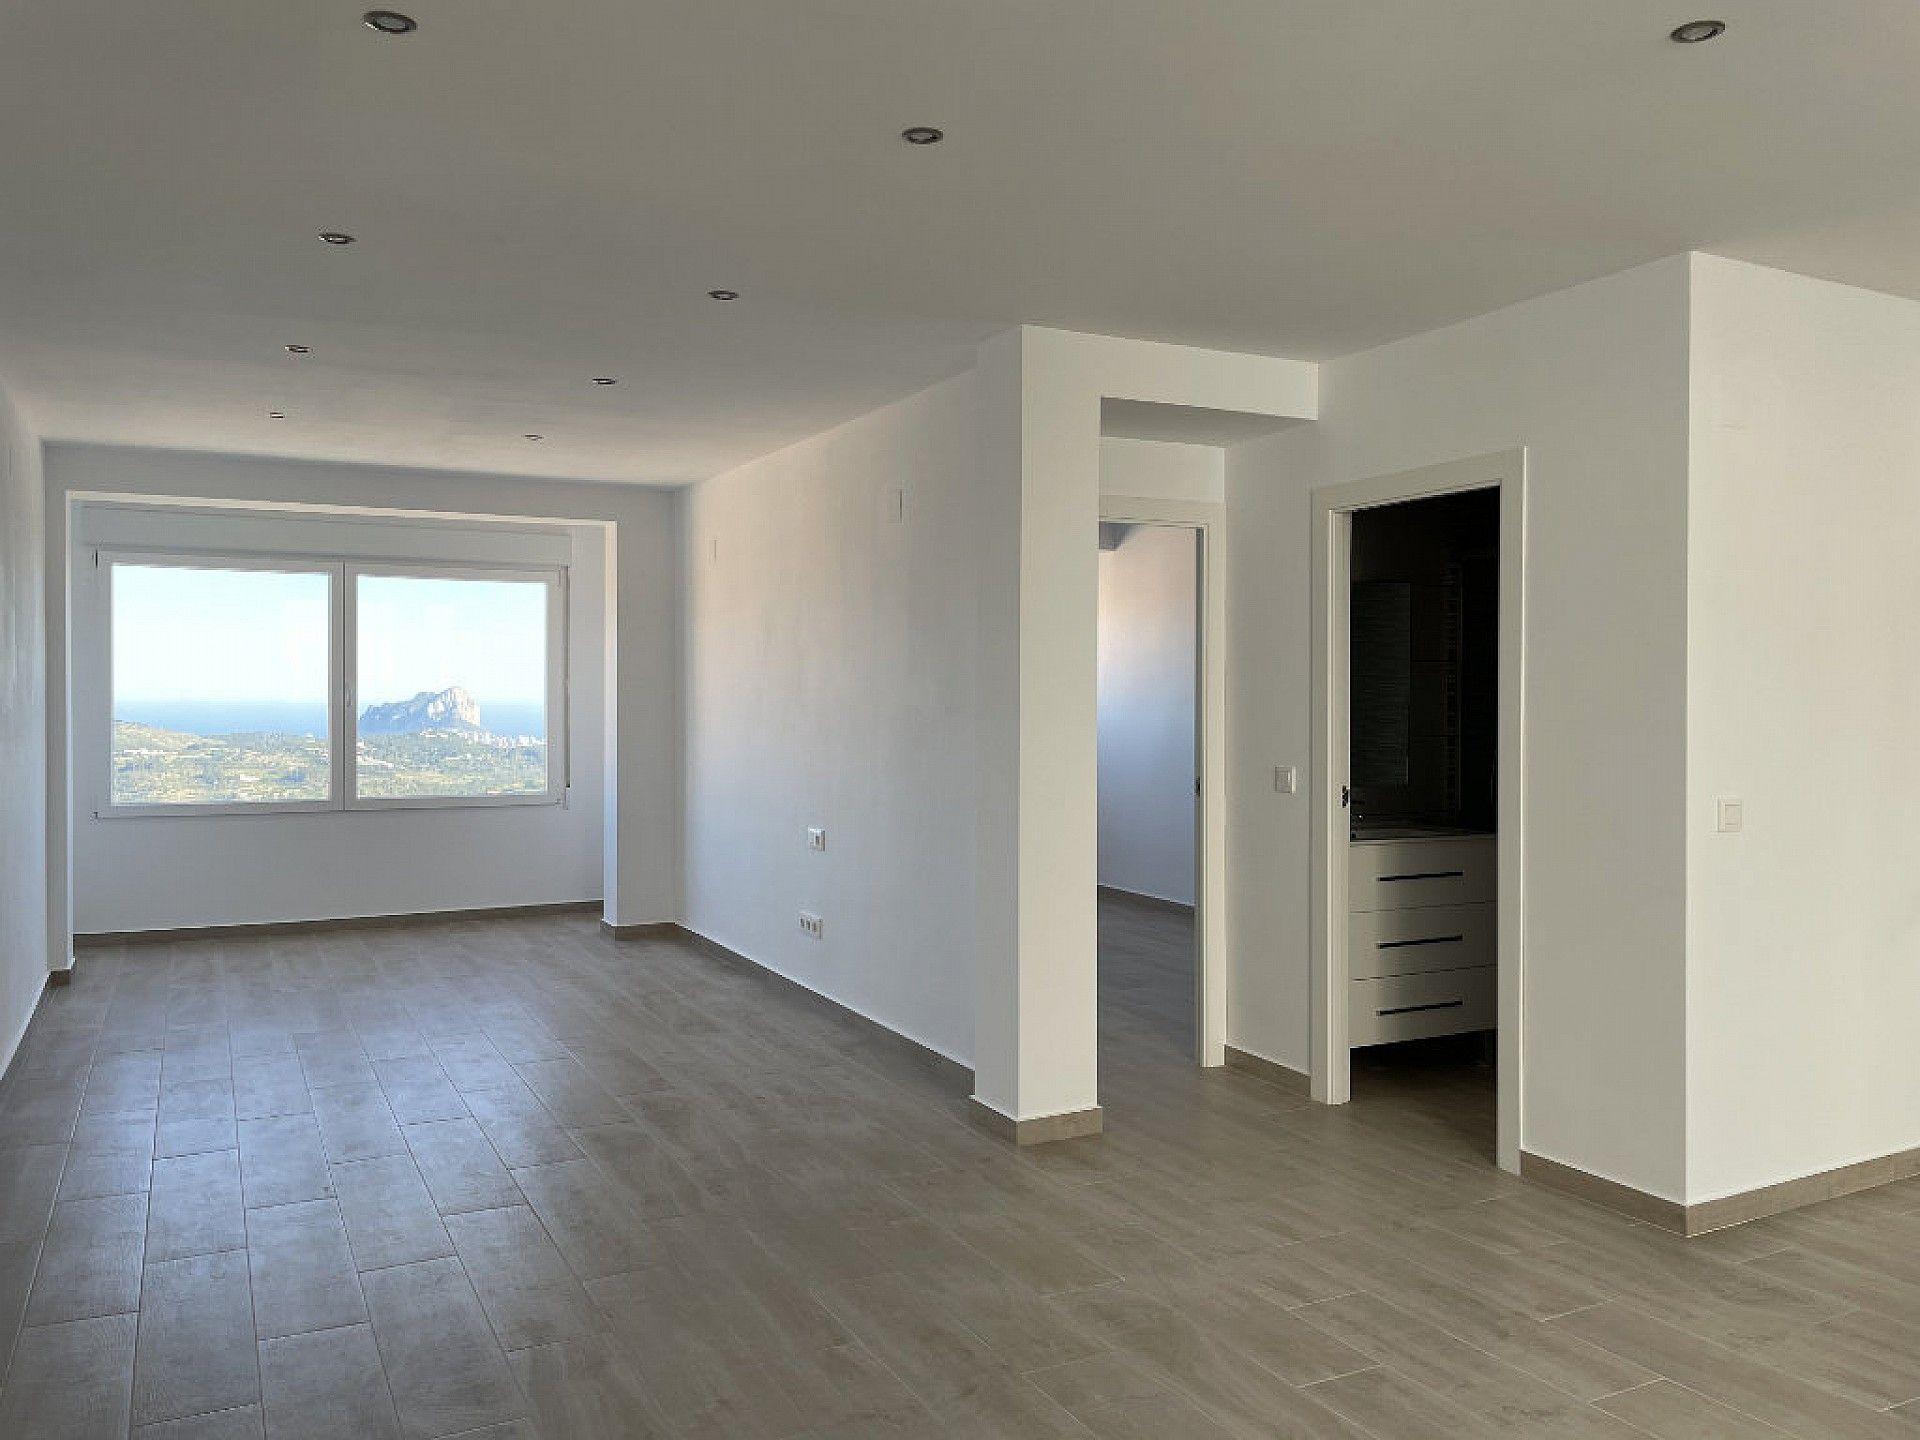 w_appartement-te-koop-costa-blanca-benissa-spanje-a1018-014-5.jpg